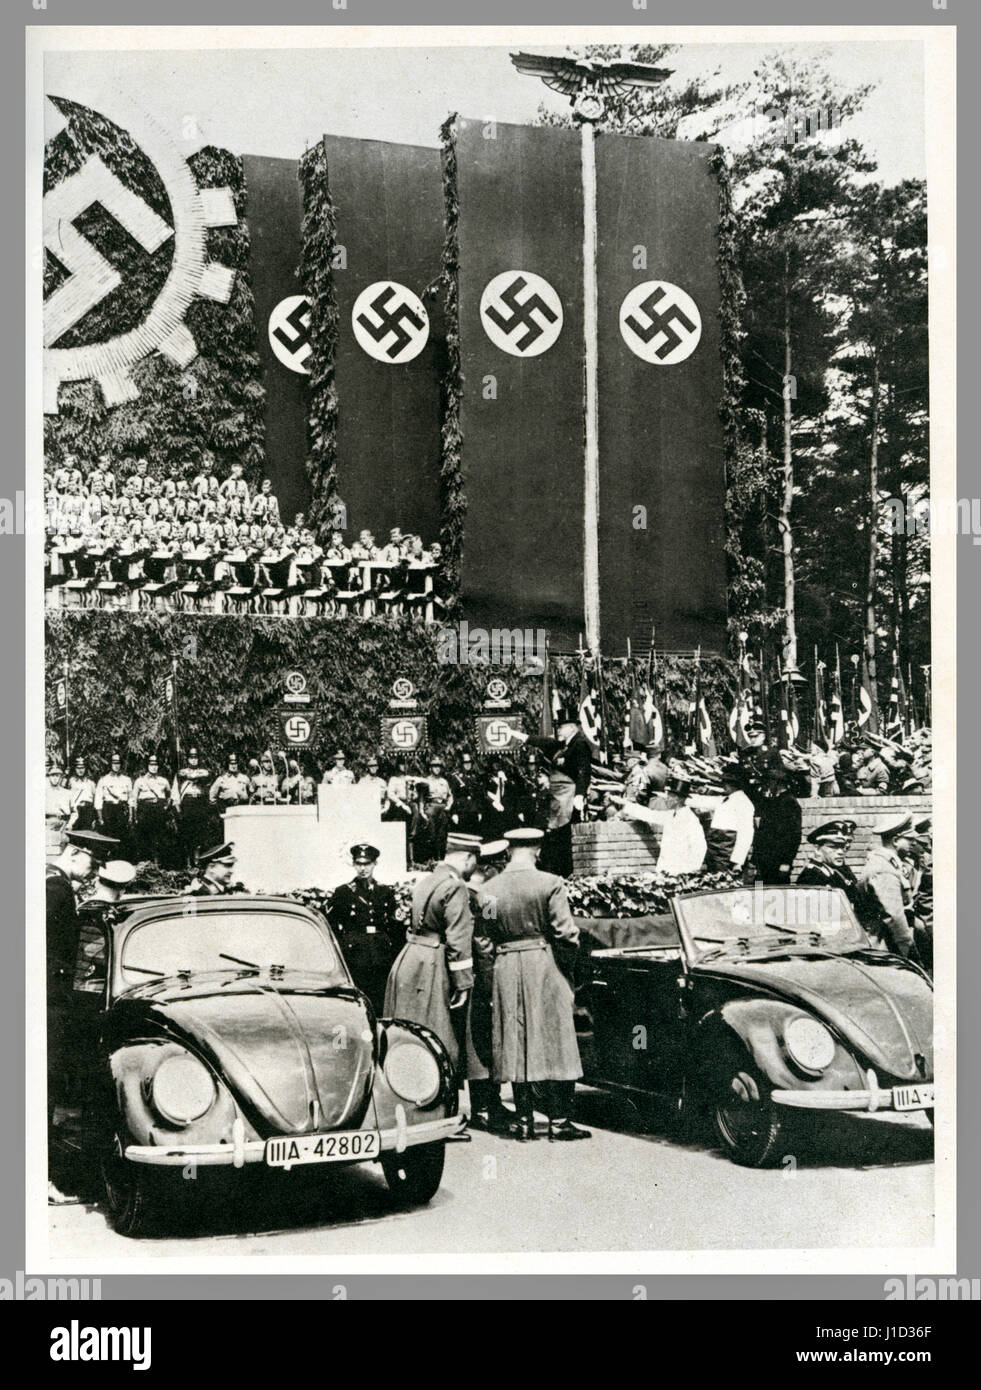 Autobahn 1930s Stock Photos Amp Autobahn 1930s Stock Images